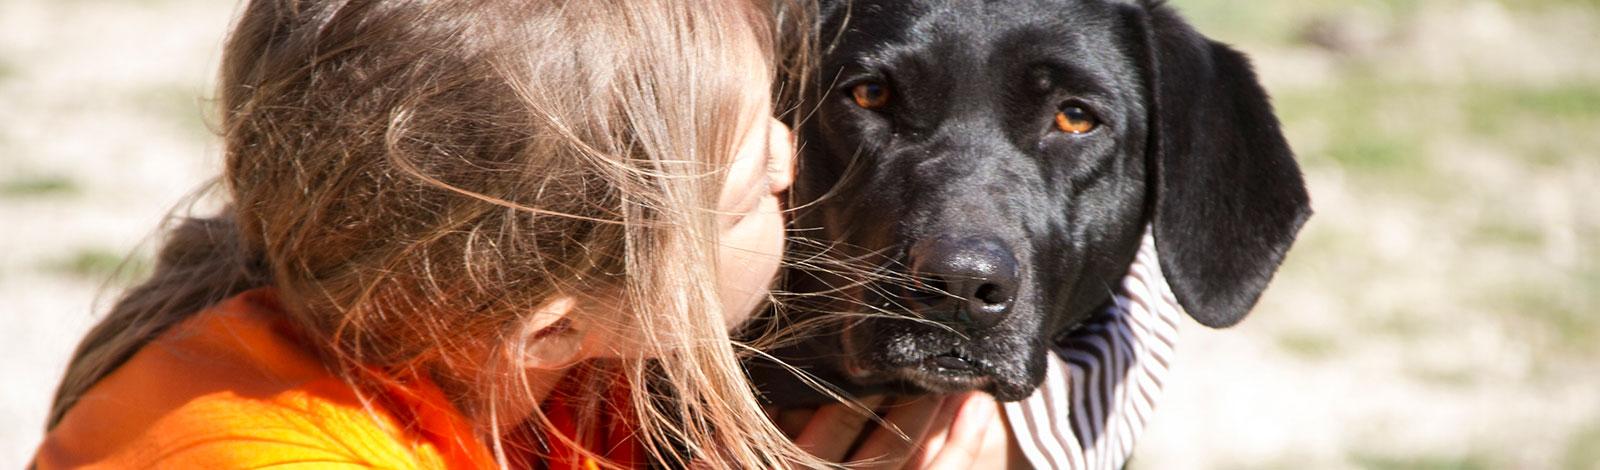 Terapia_asistida_con_animales_0055_humanymal